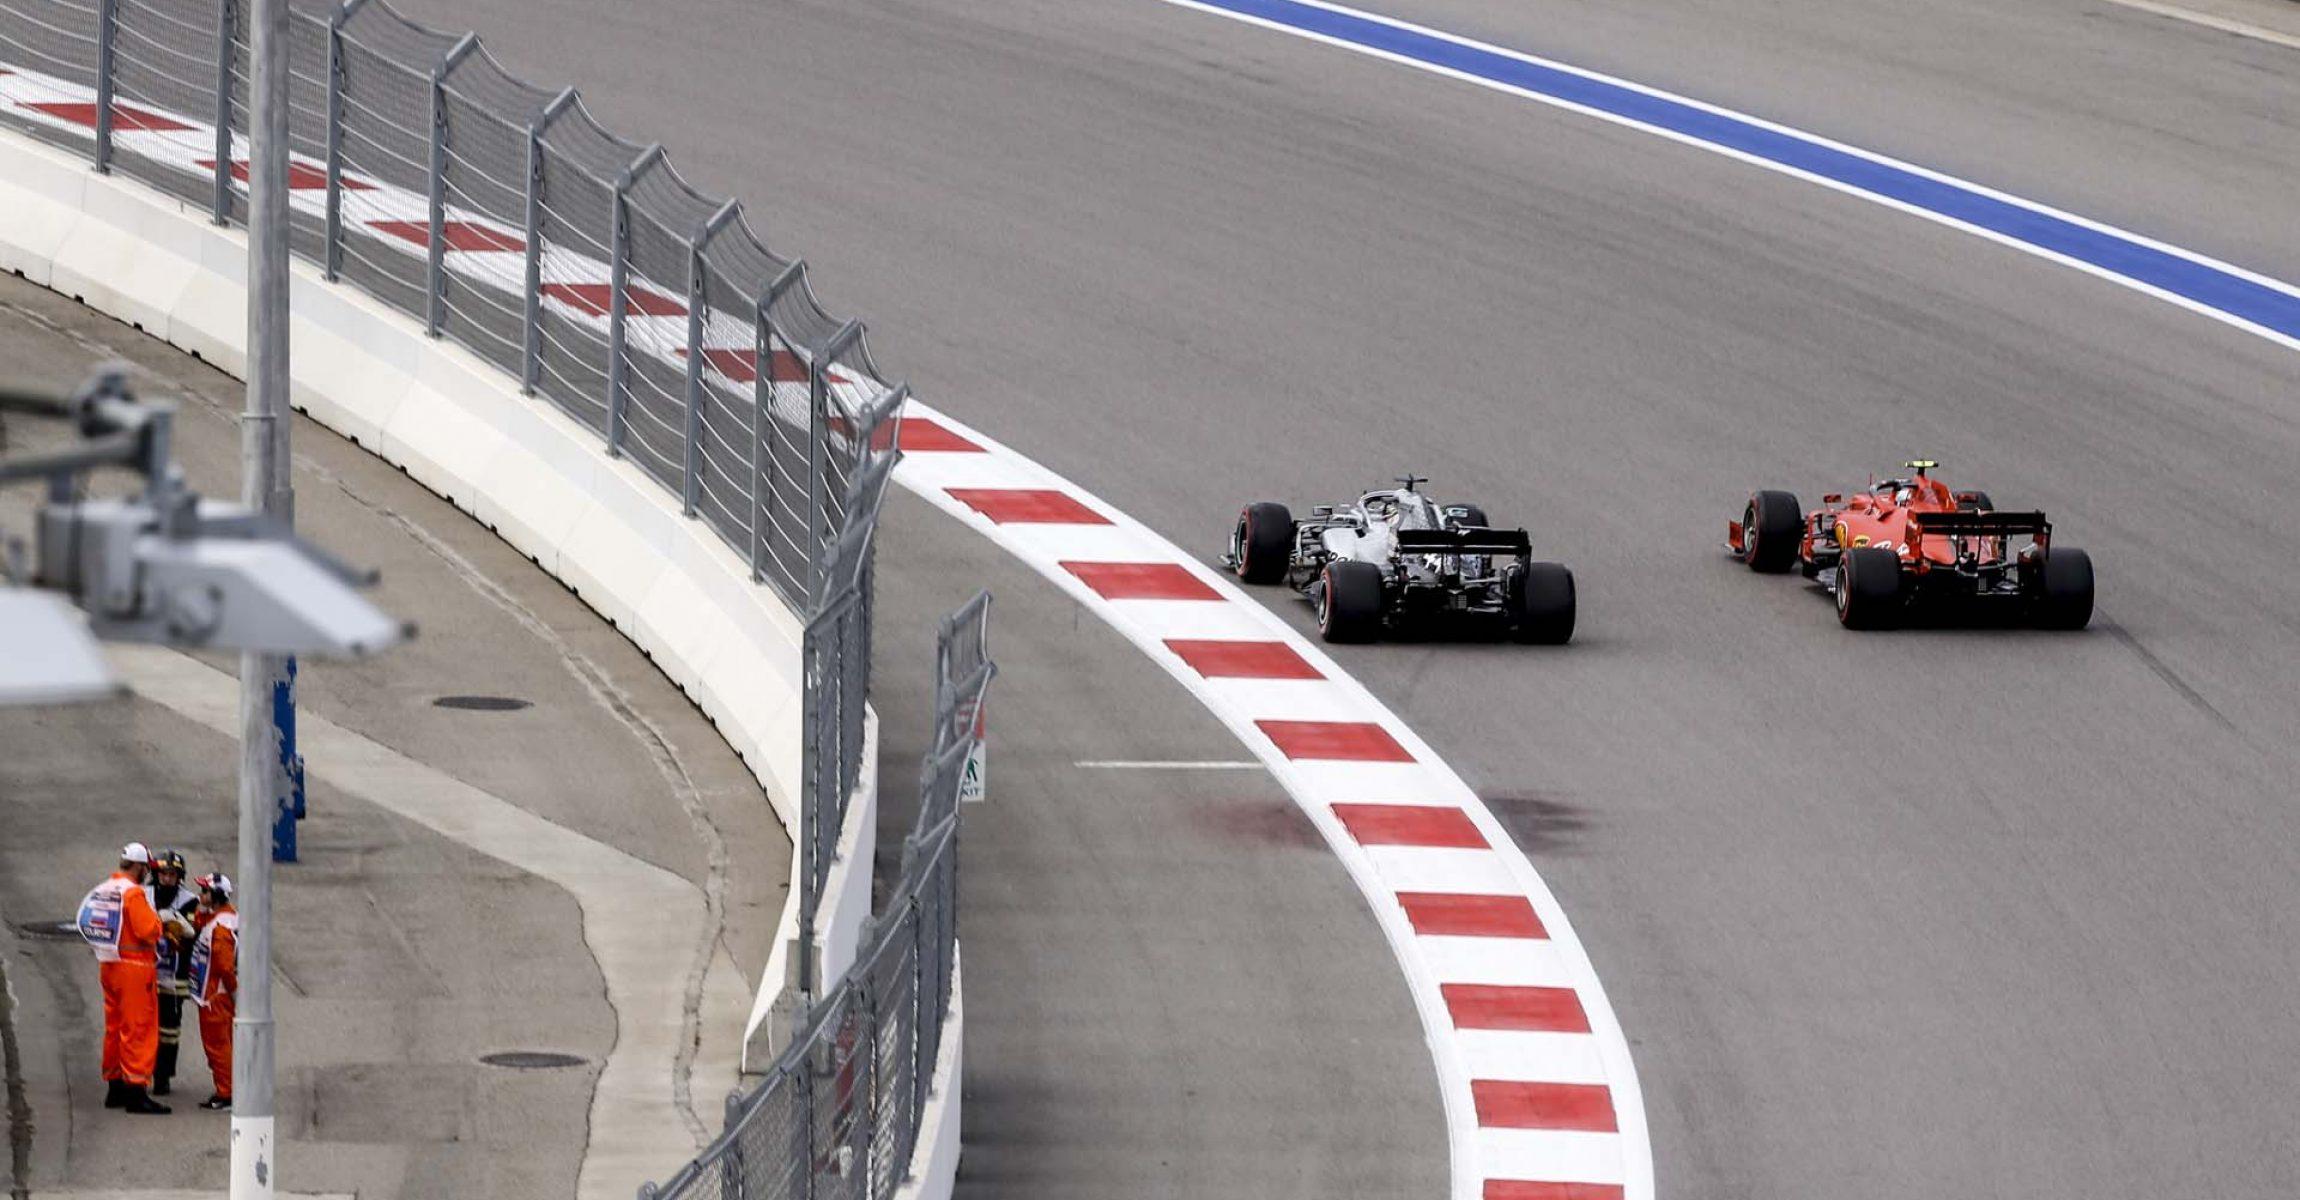 2019 Russian Grand Prix, Saturday - Wolfgang Wilhelm Lewis Hamilton Mercedes Charles Leclerc Ferrari